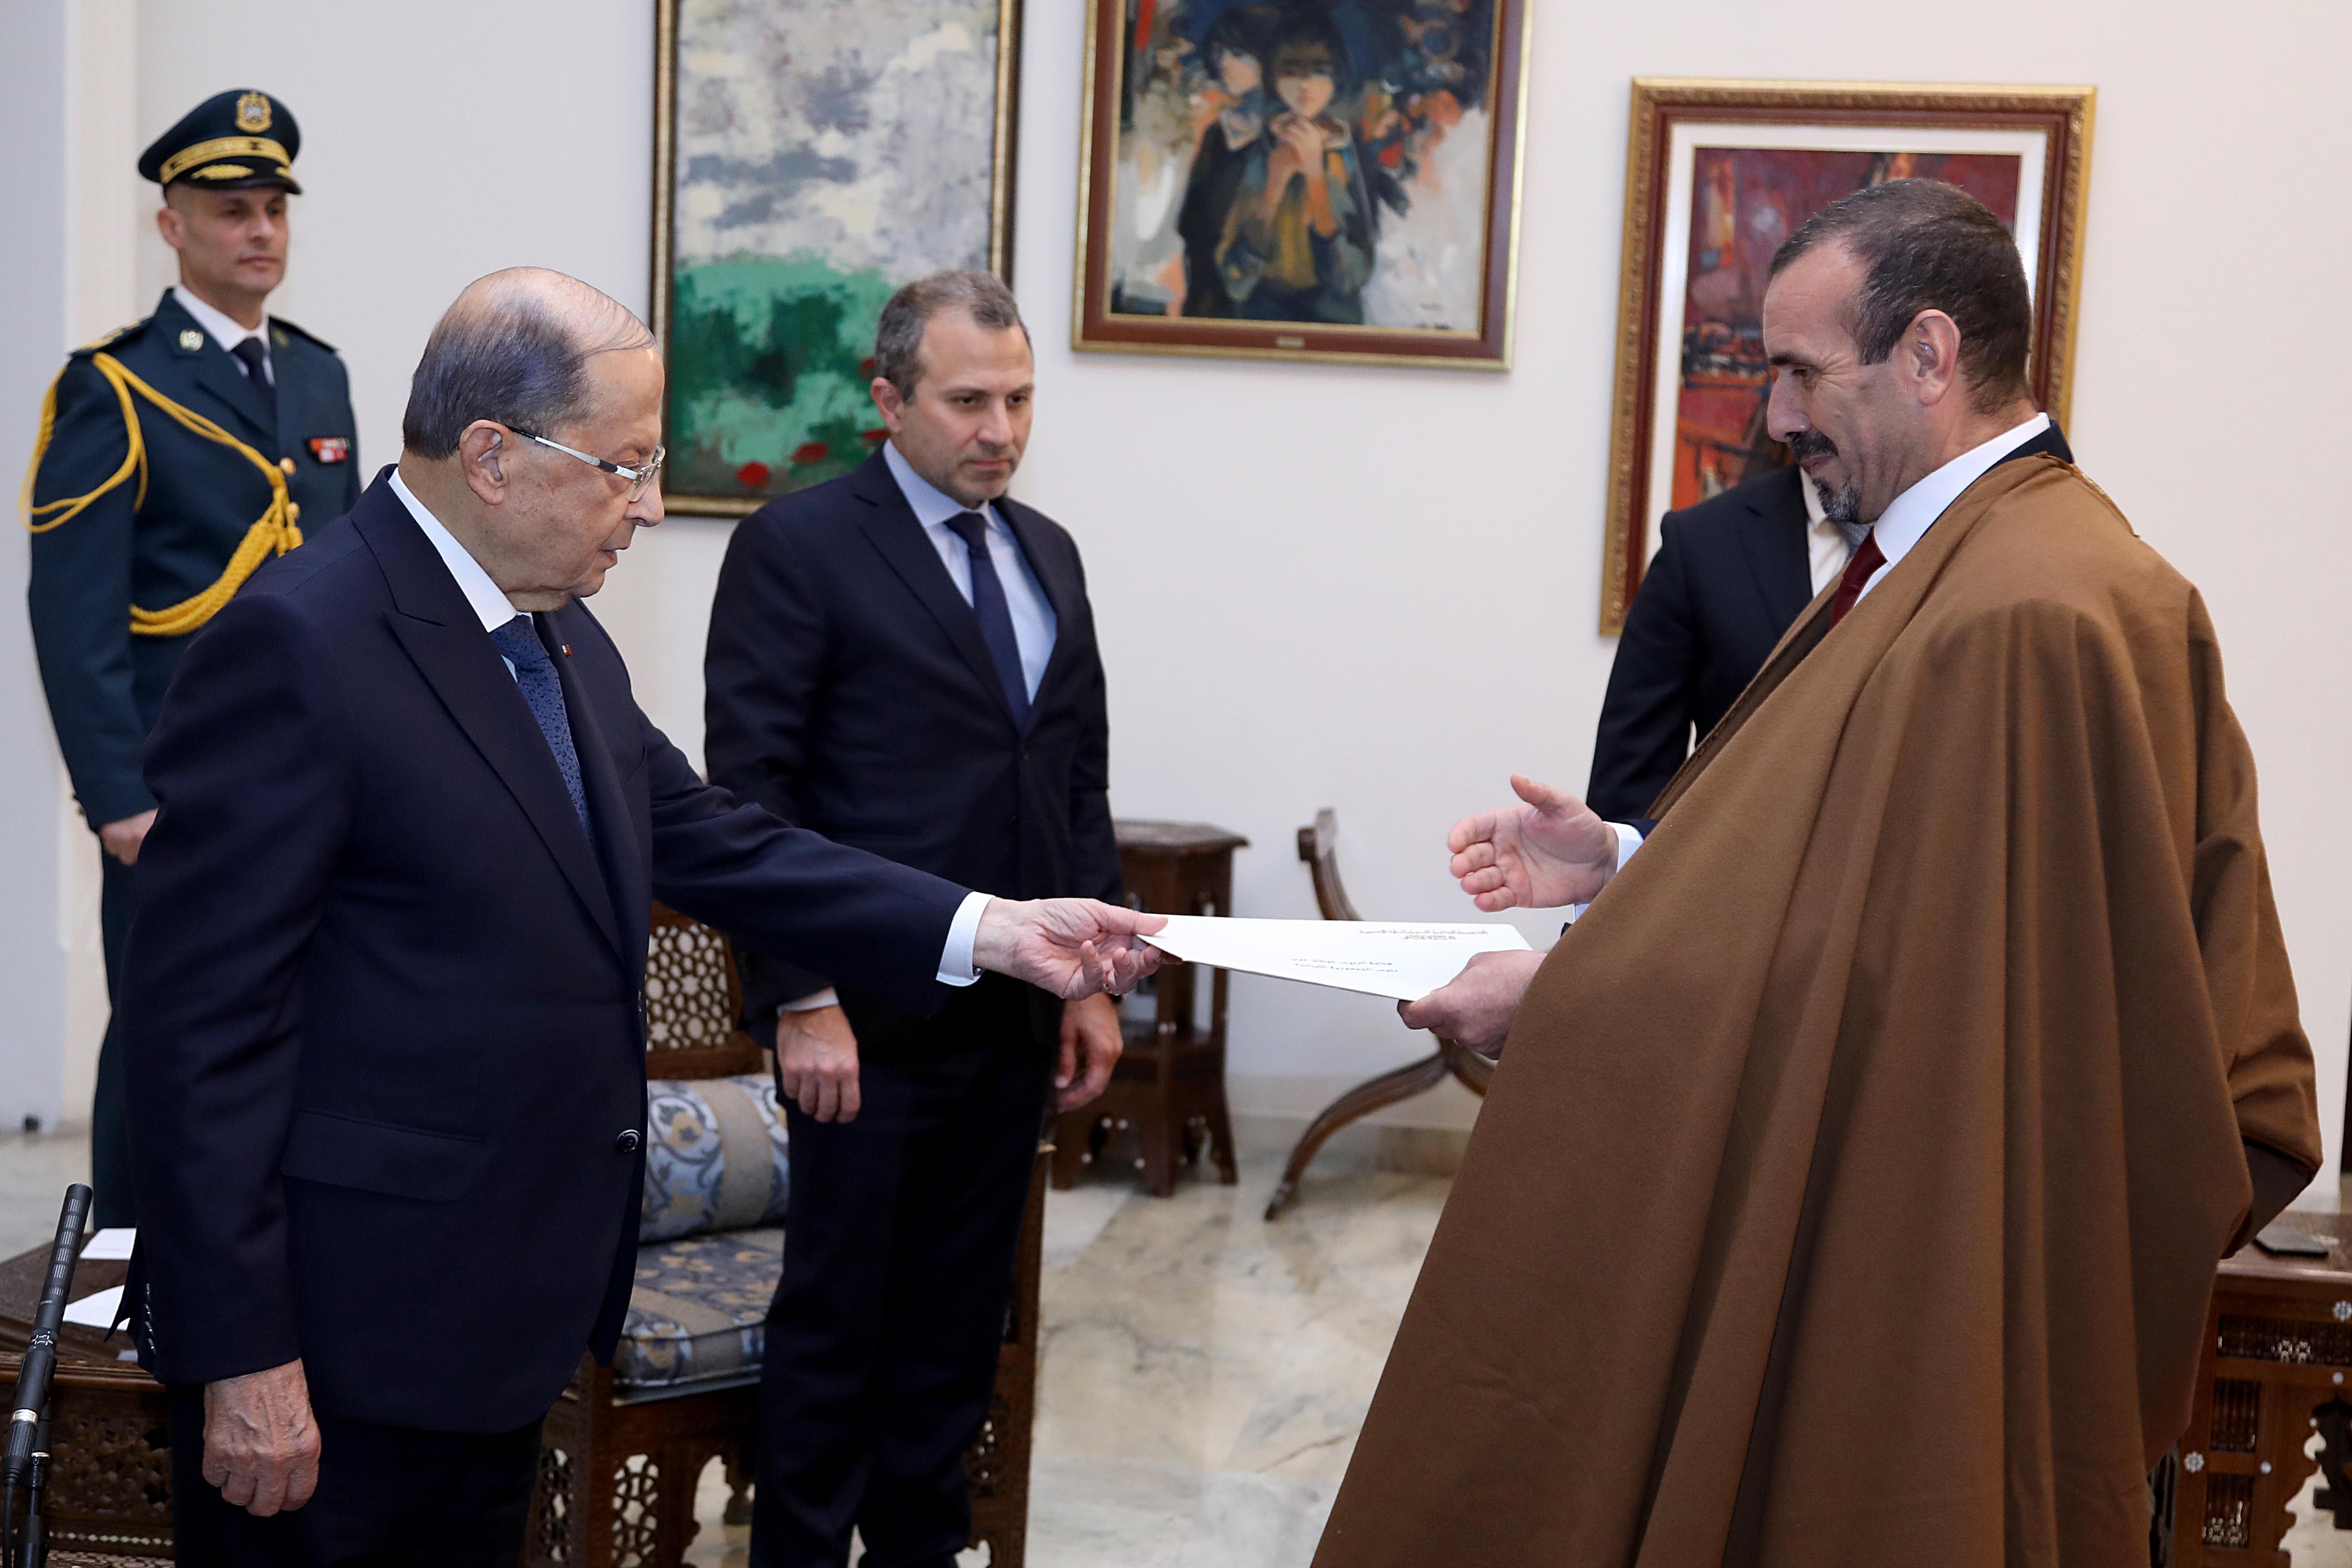 6 -People's Democrat Republic of Algeria Abed Karim Rikayib